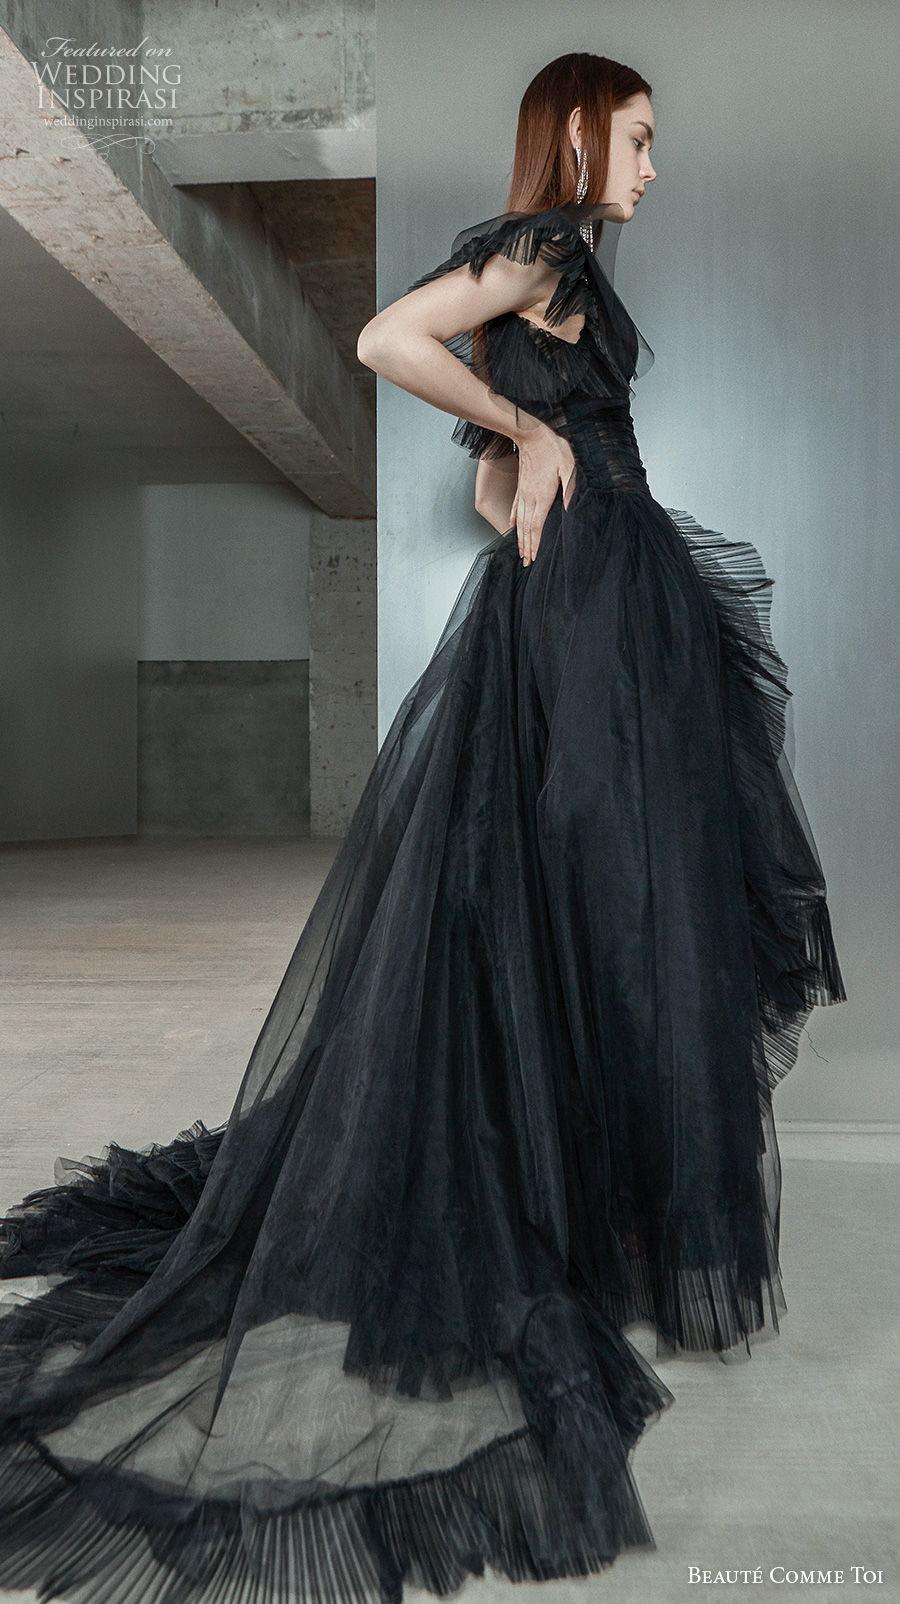 beaute comme toi 2021 bridal short butterfly sleeves v neck ruched bodice bohemian black wedding dress v back chapel train (dorothy) sdv